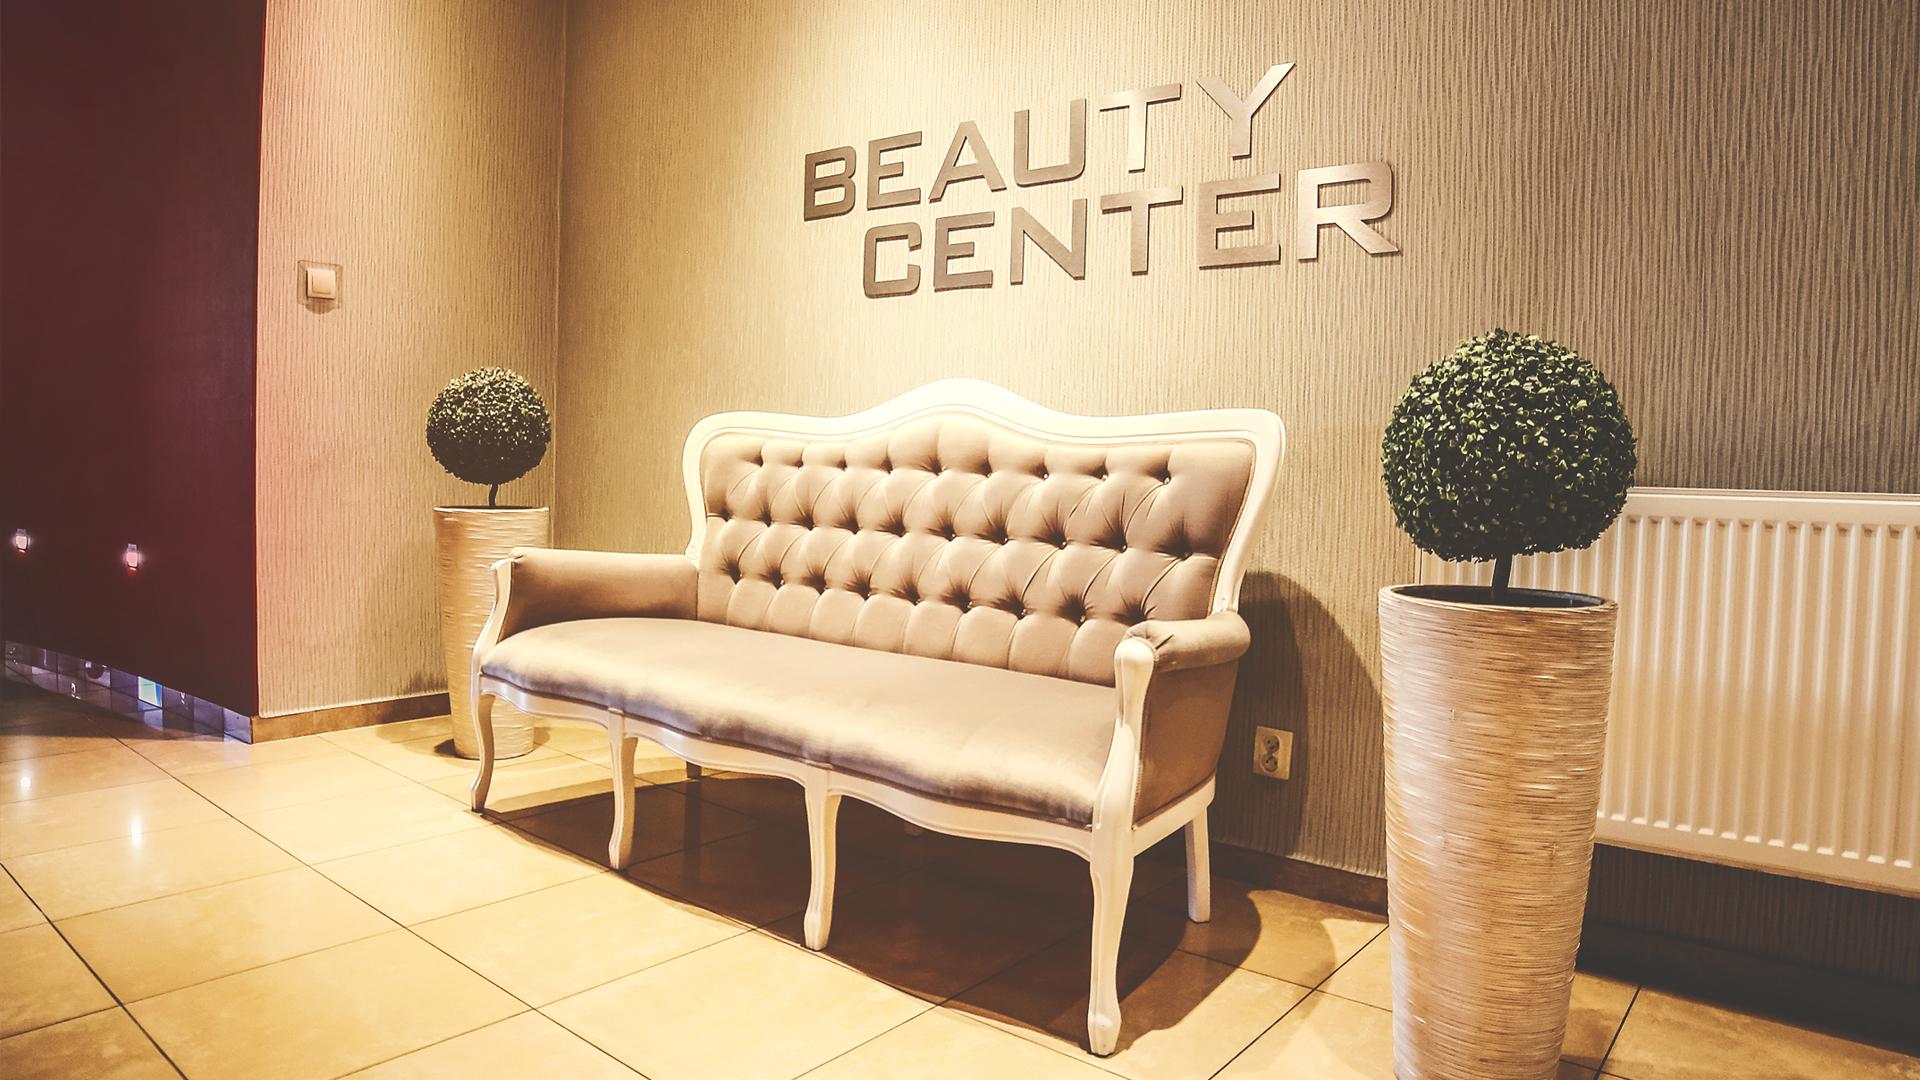 Hol Beauty Center